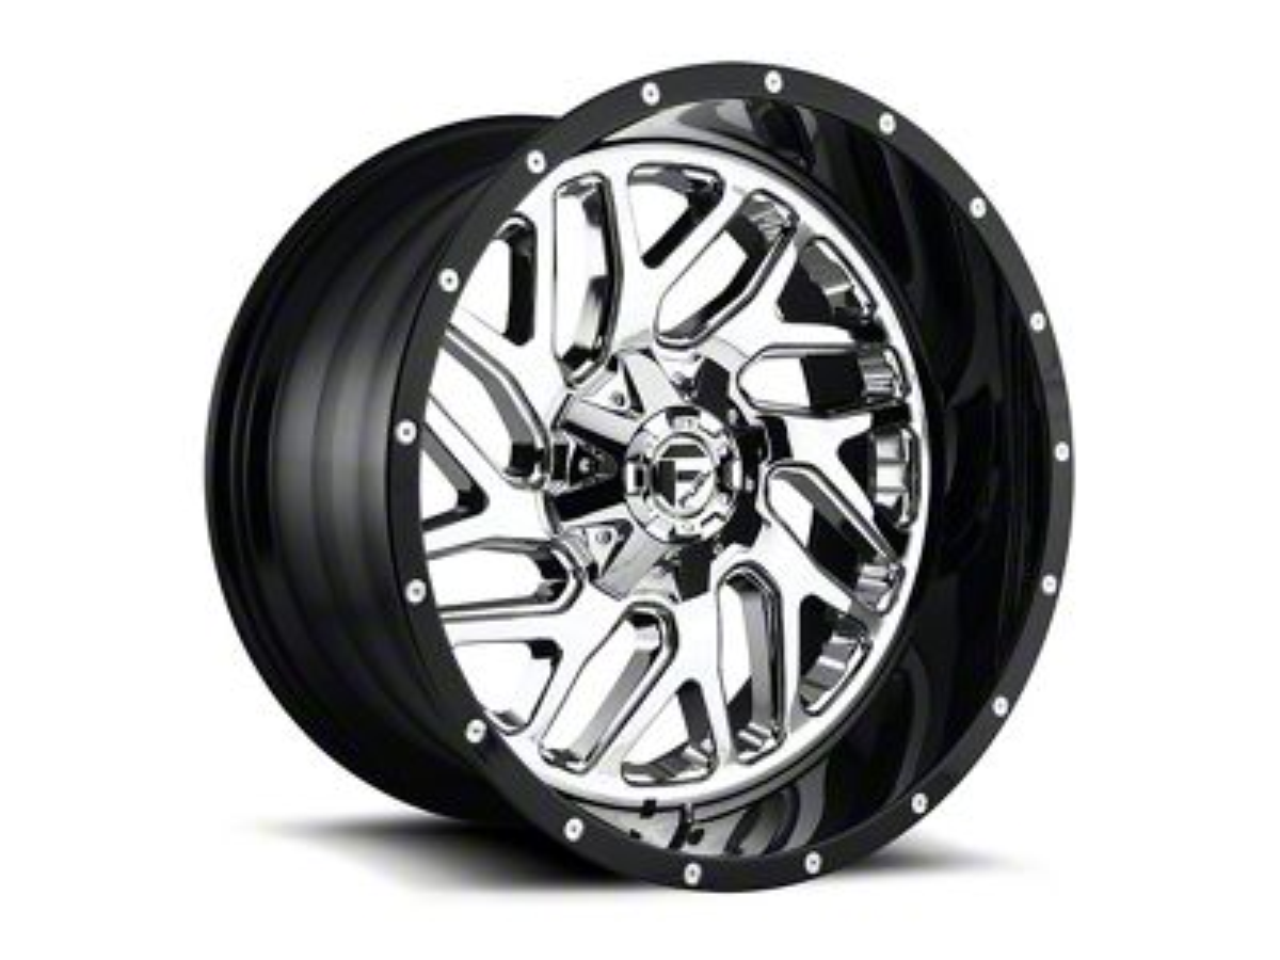 Fuel Wheels Triton Chrome 6-Lug Wheel - 22x10 (99-18 Silverado 1500)